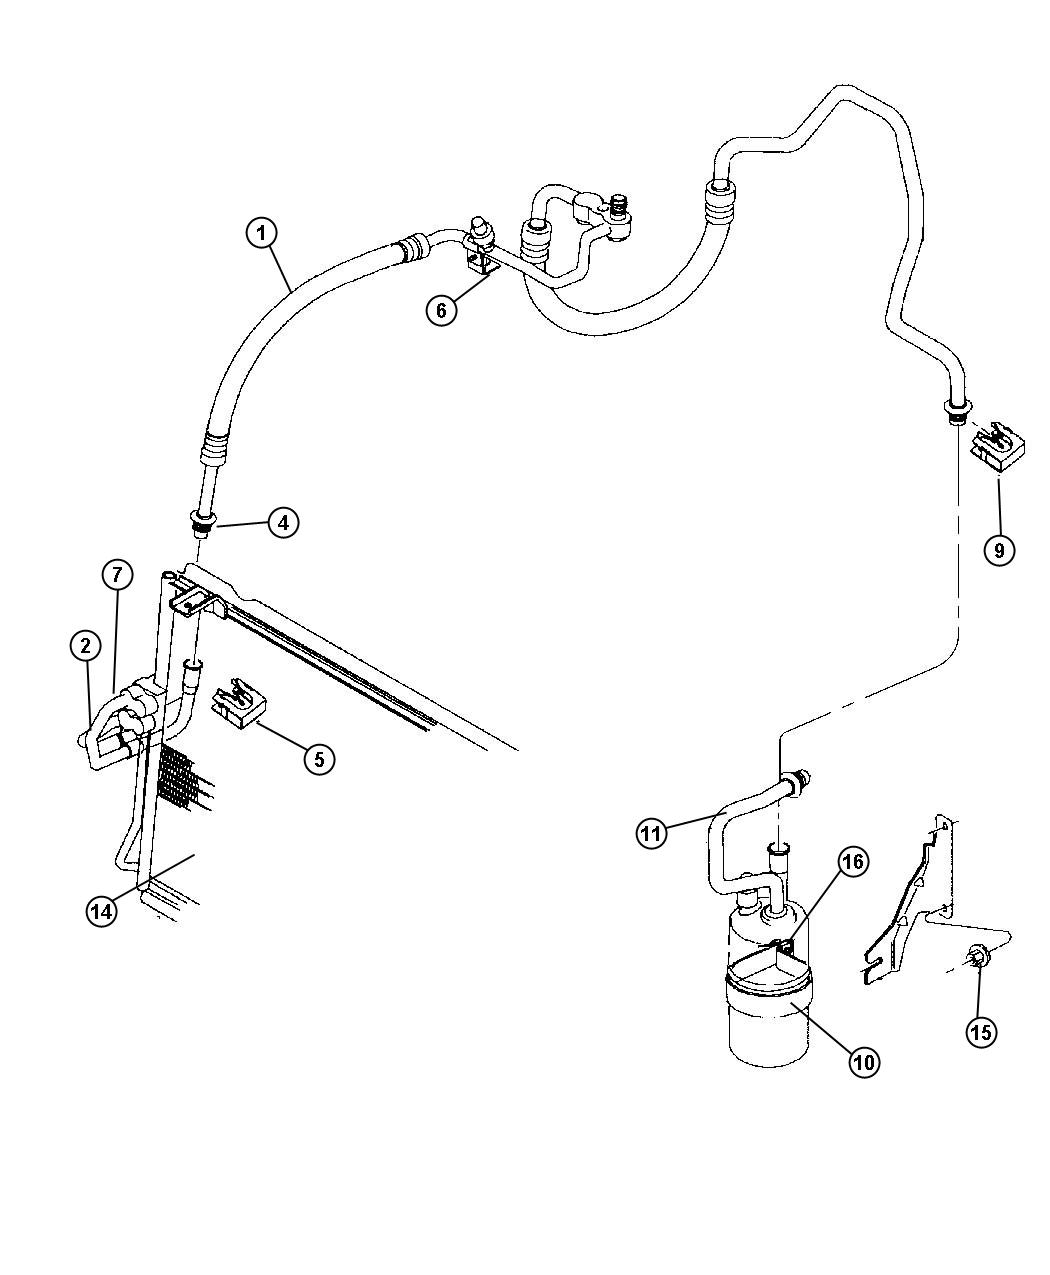 Jeep Cherokee Switch. A/c high pressure cut off. High